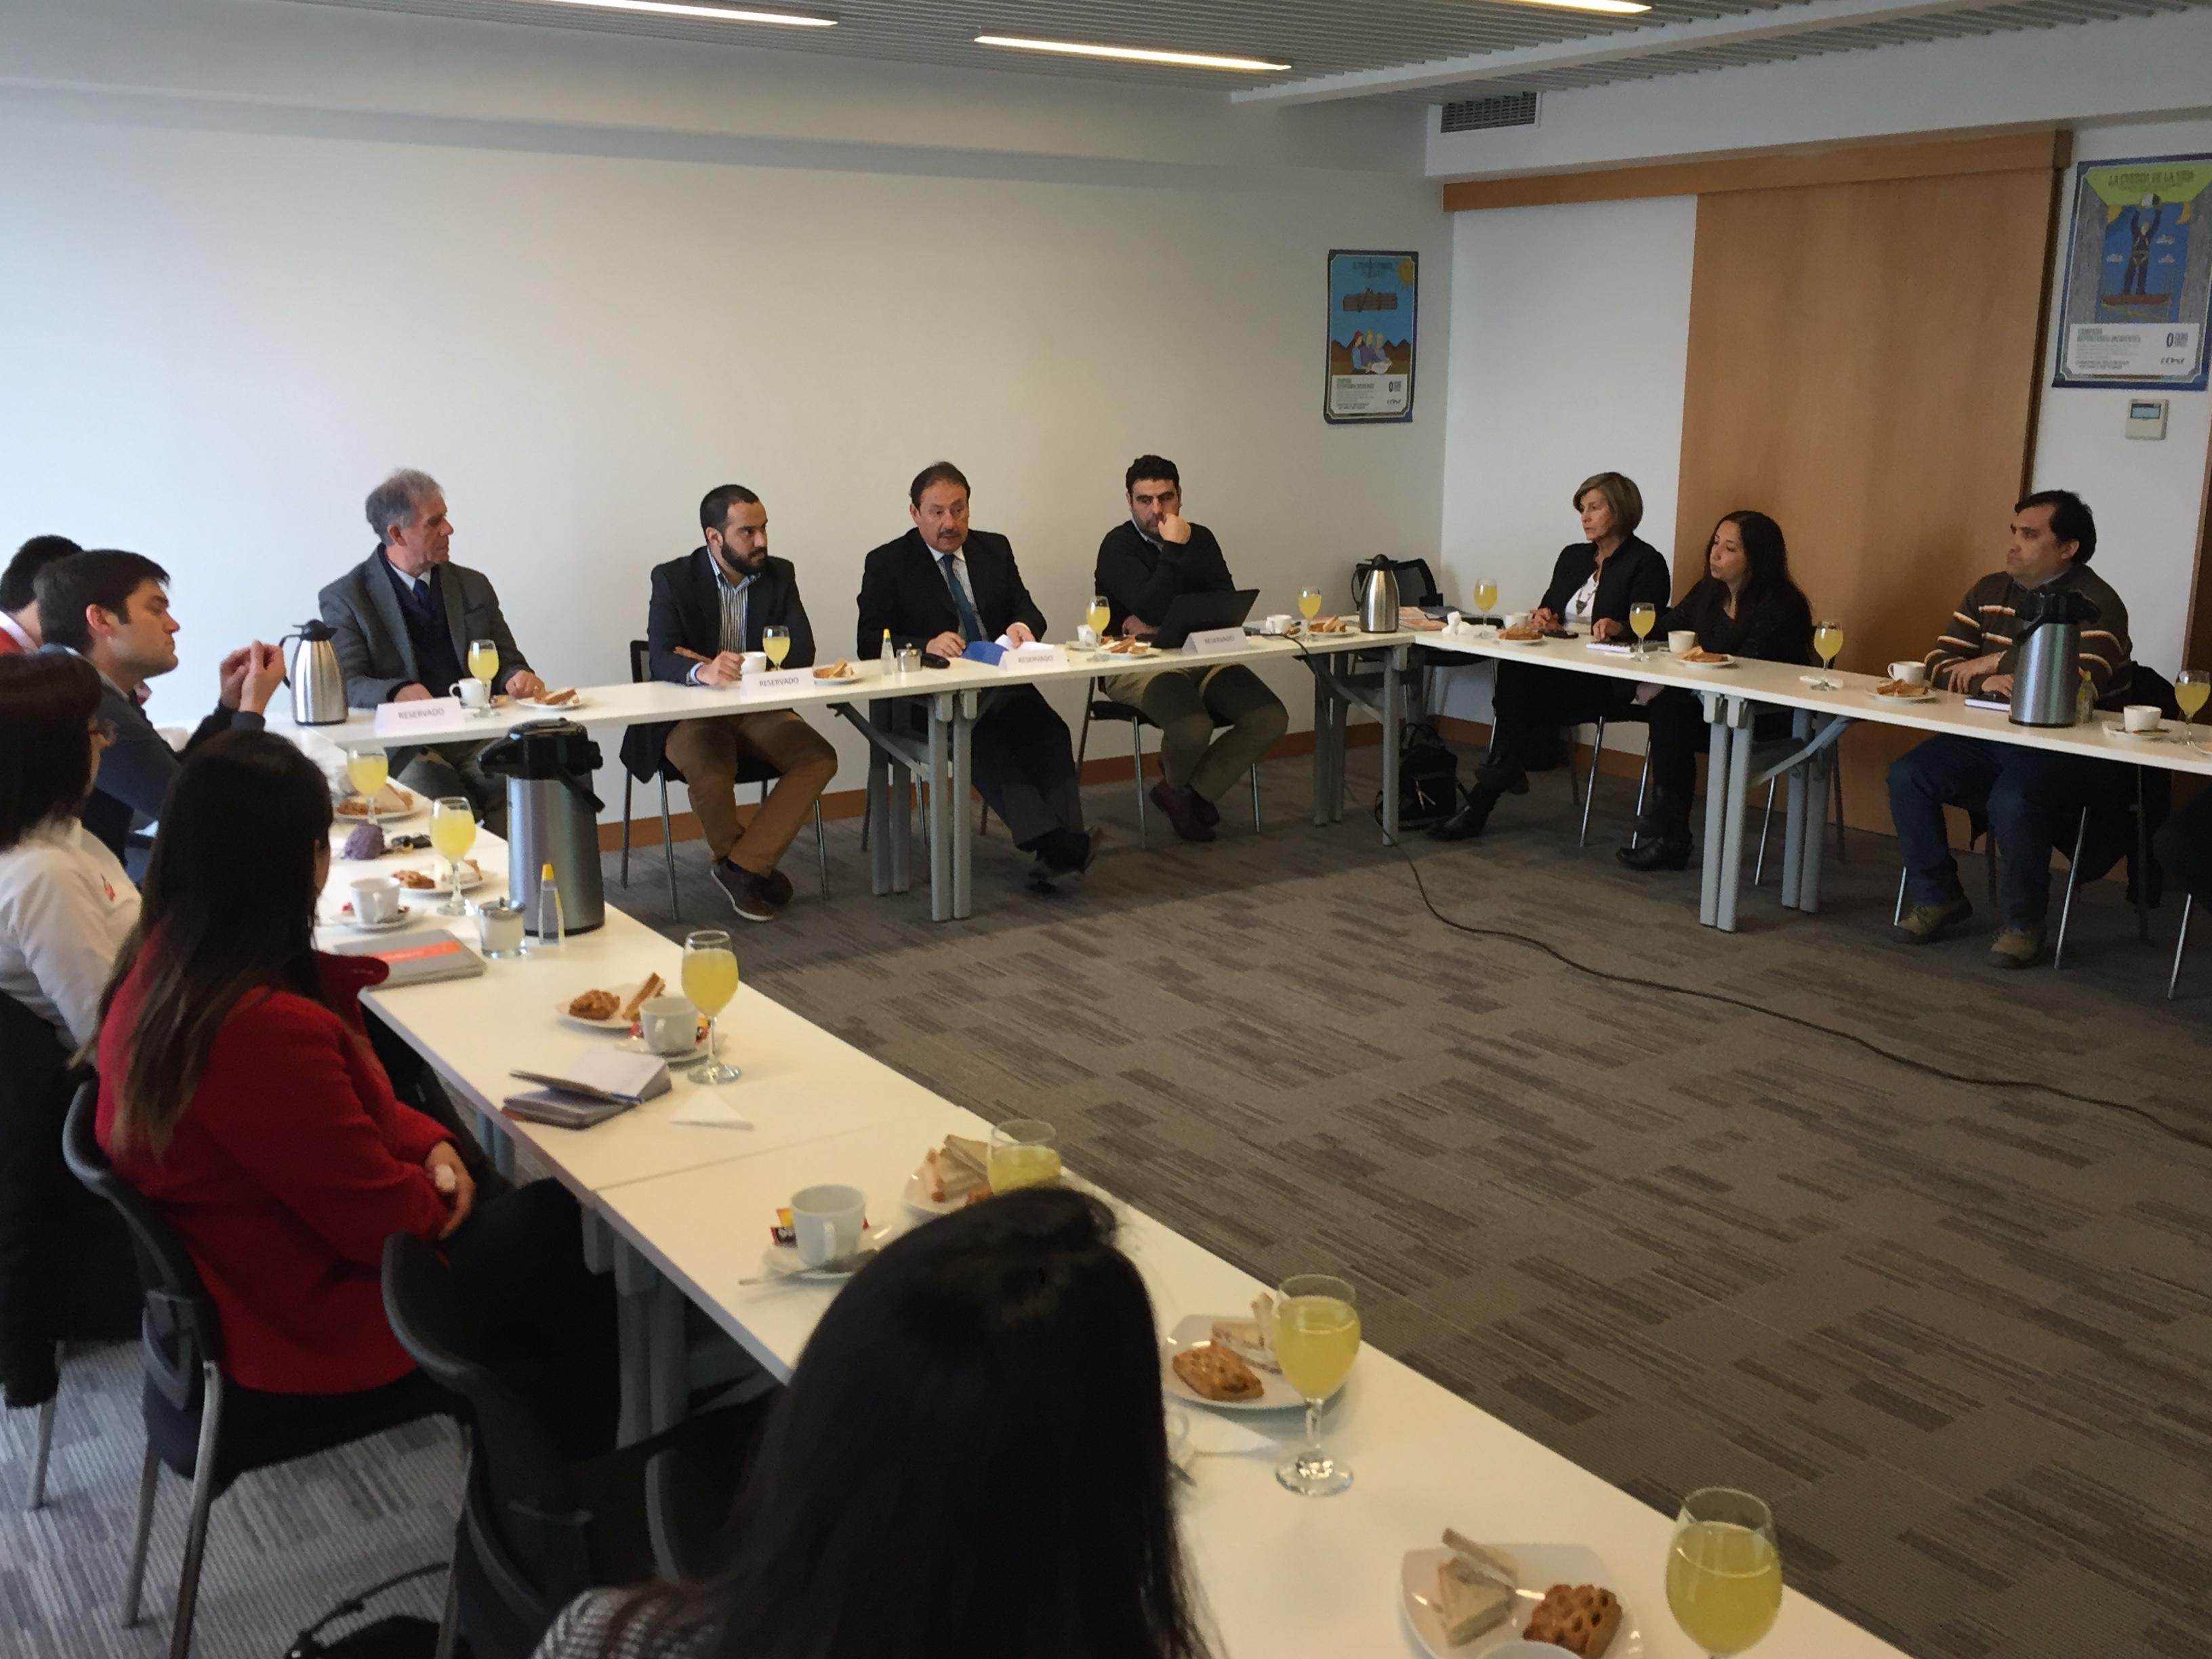 Socios de Concepción participaron en exitosa misión a Dinamarca noticias